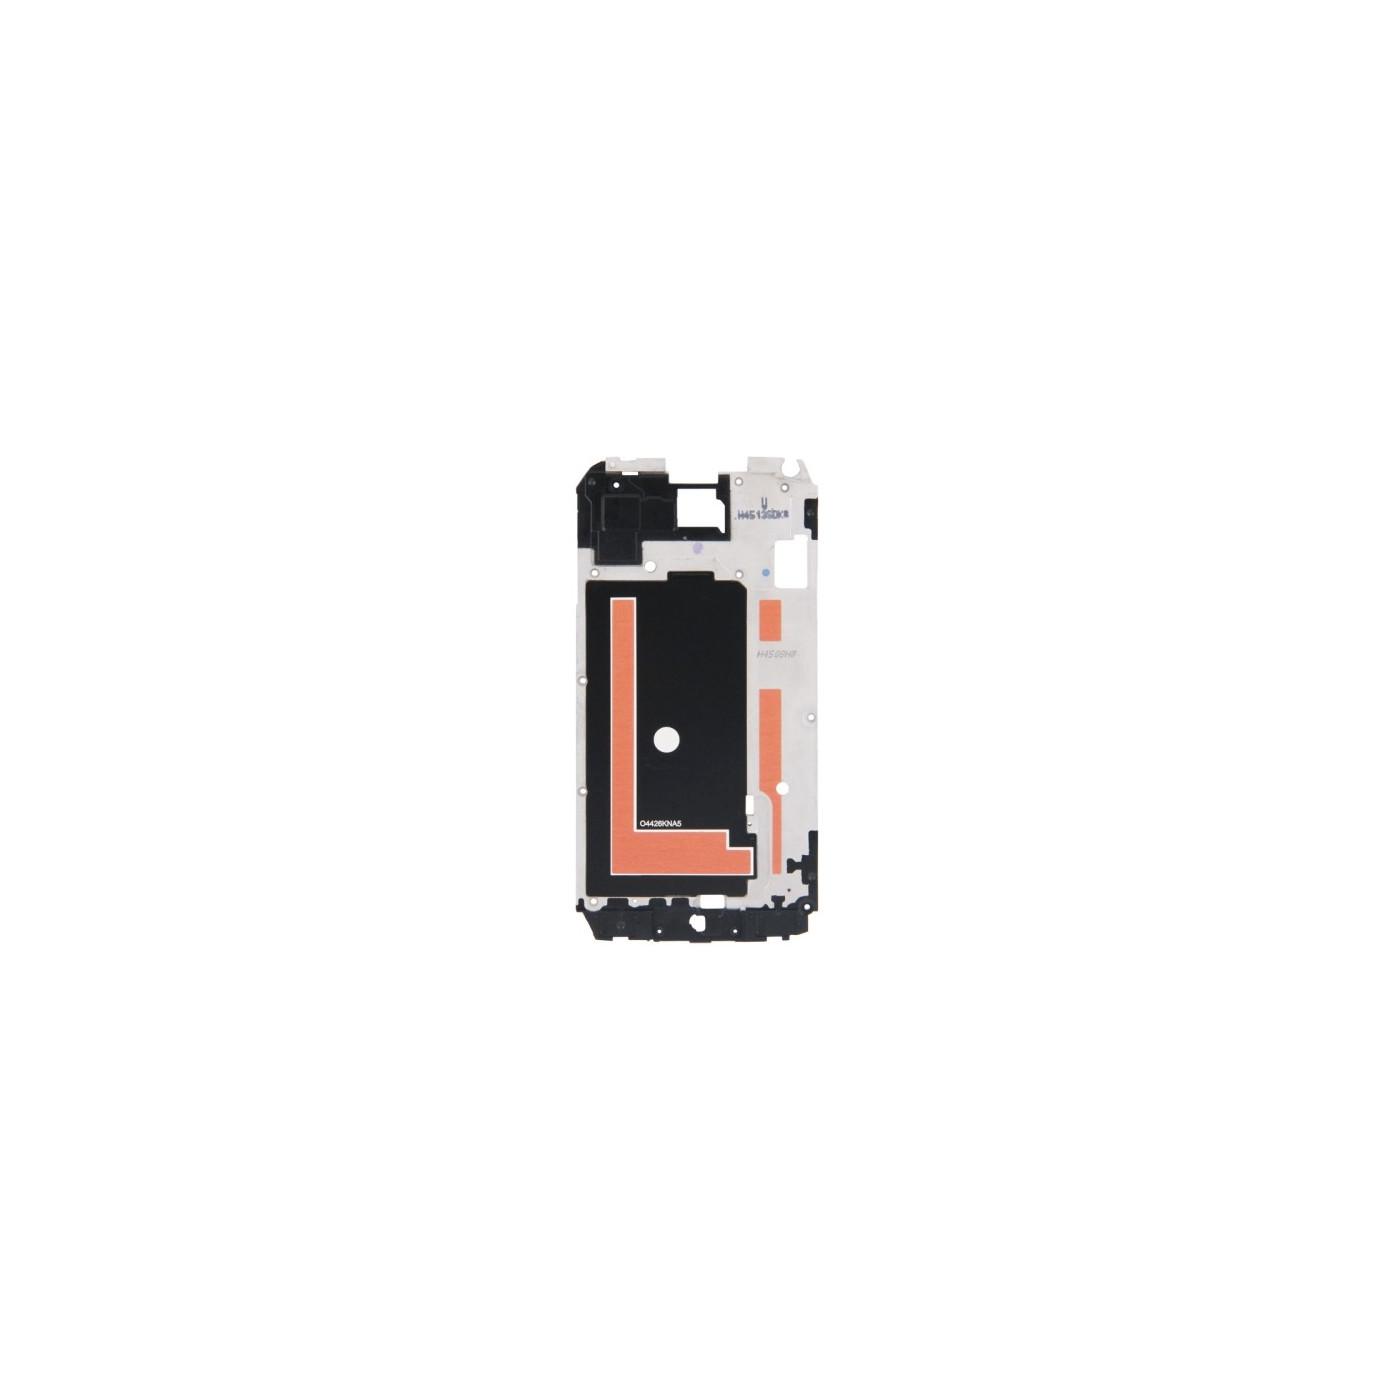 Cadre à cadre à cadre LCD pour Samsung Galaxy S5 - G900